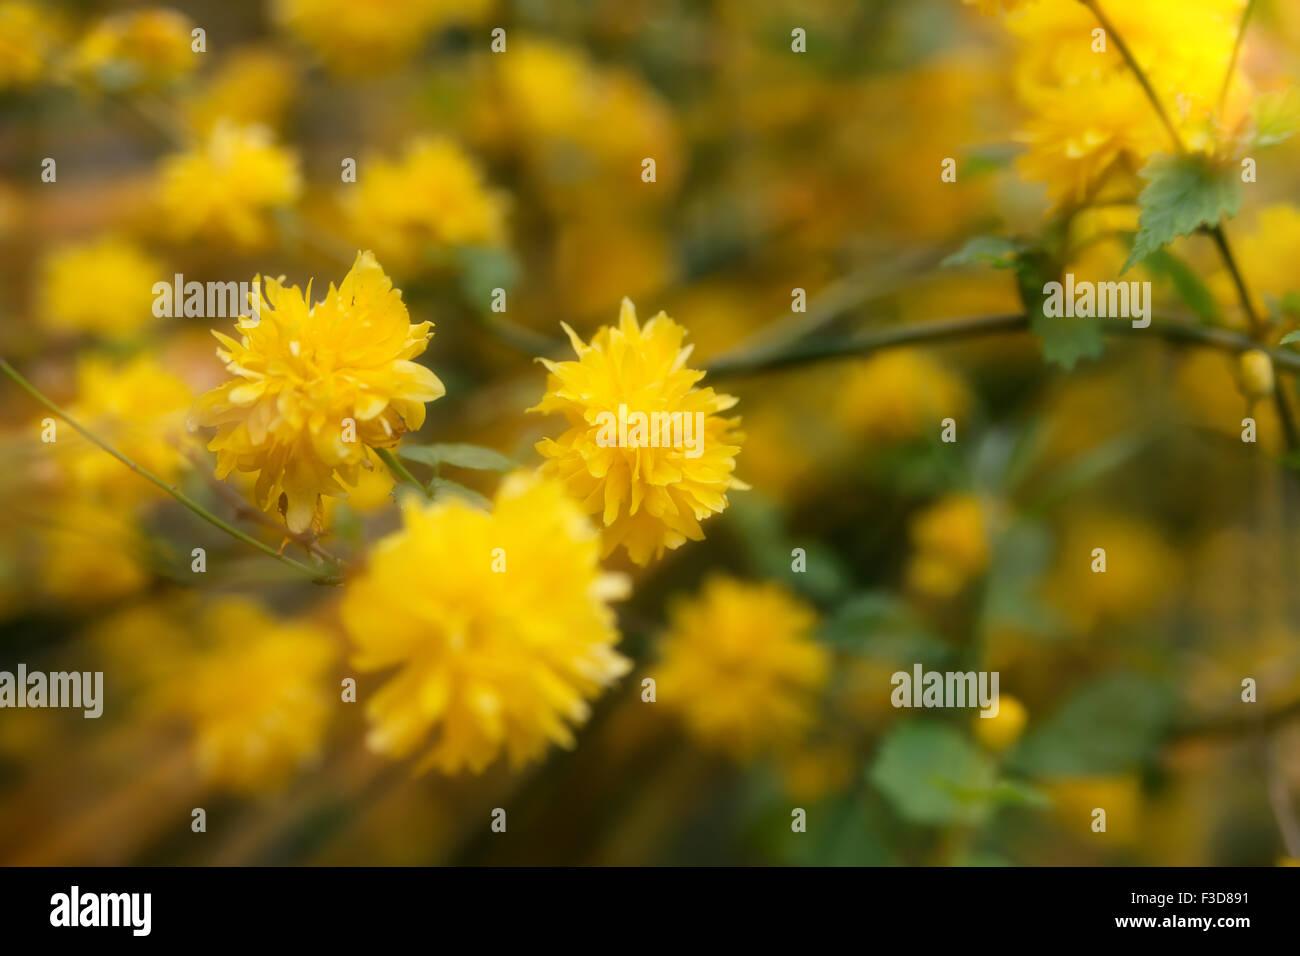 Beautiful yellow flowers blossoming in spring time under sunshine beautiful yellow flowers blossoming in spring time under sunshine natural background ireland mightylinksfo